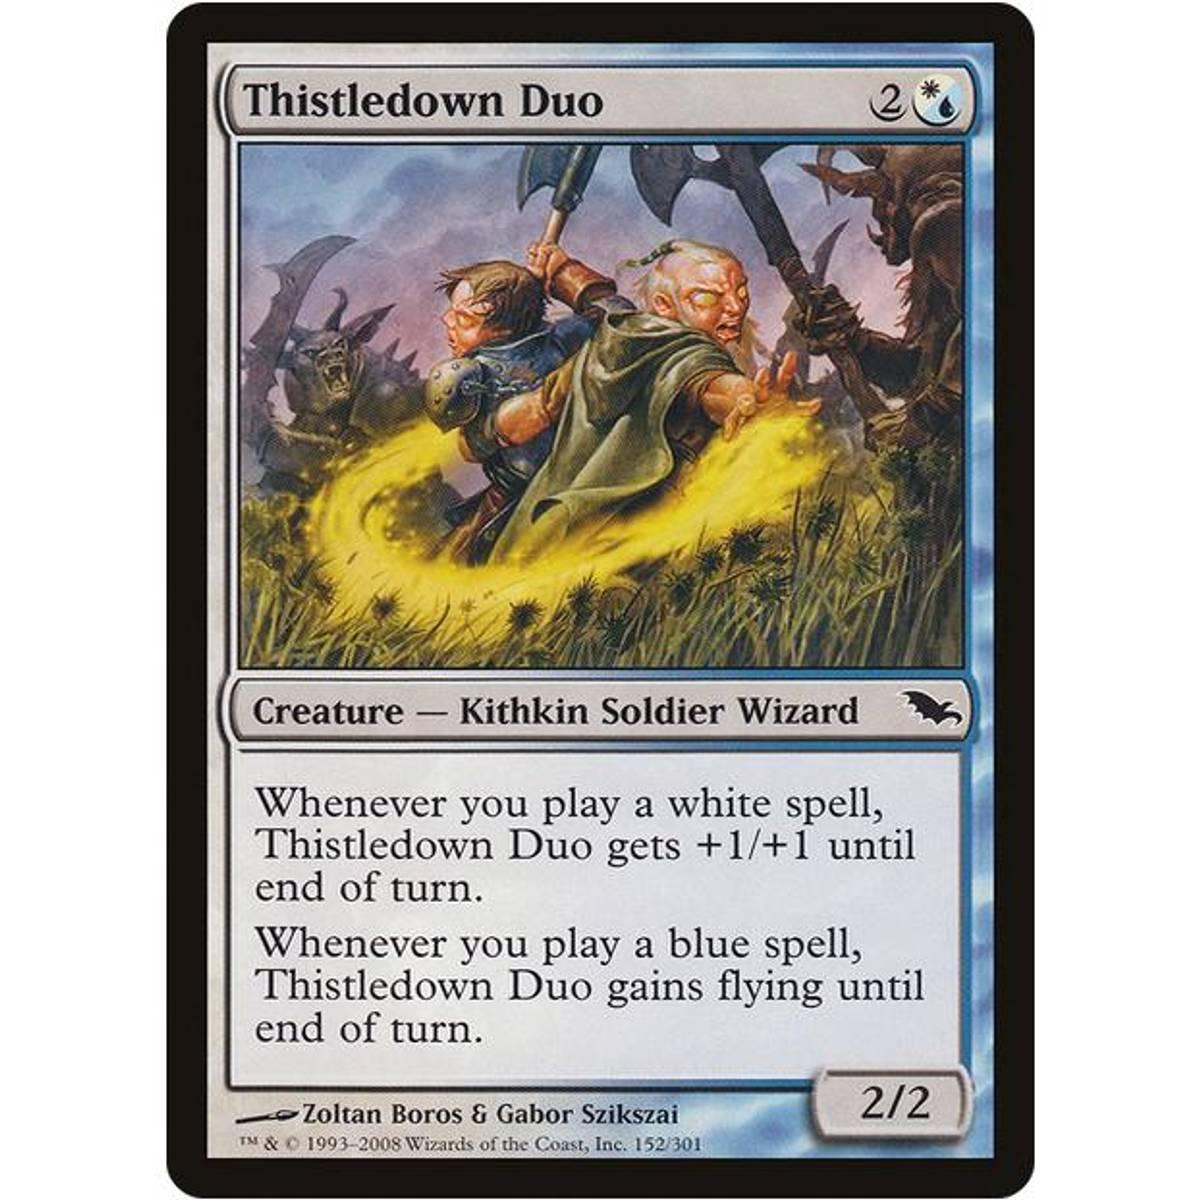 Thistledown Duo